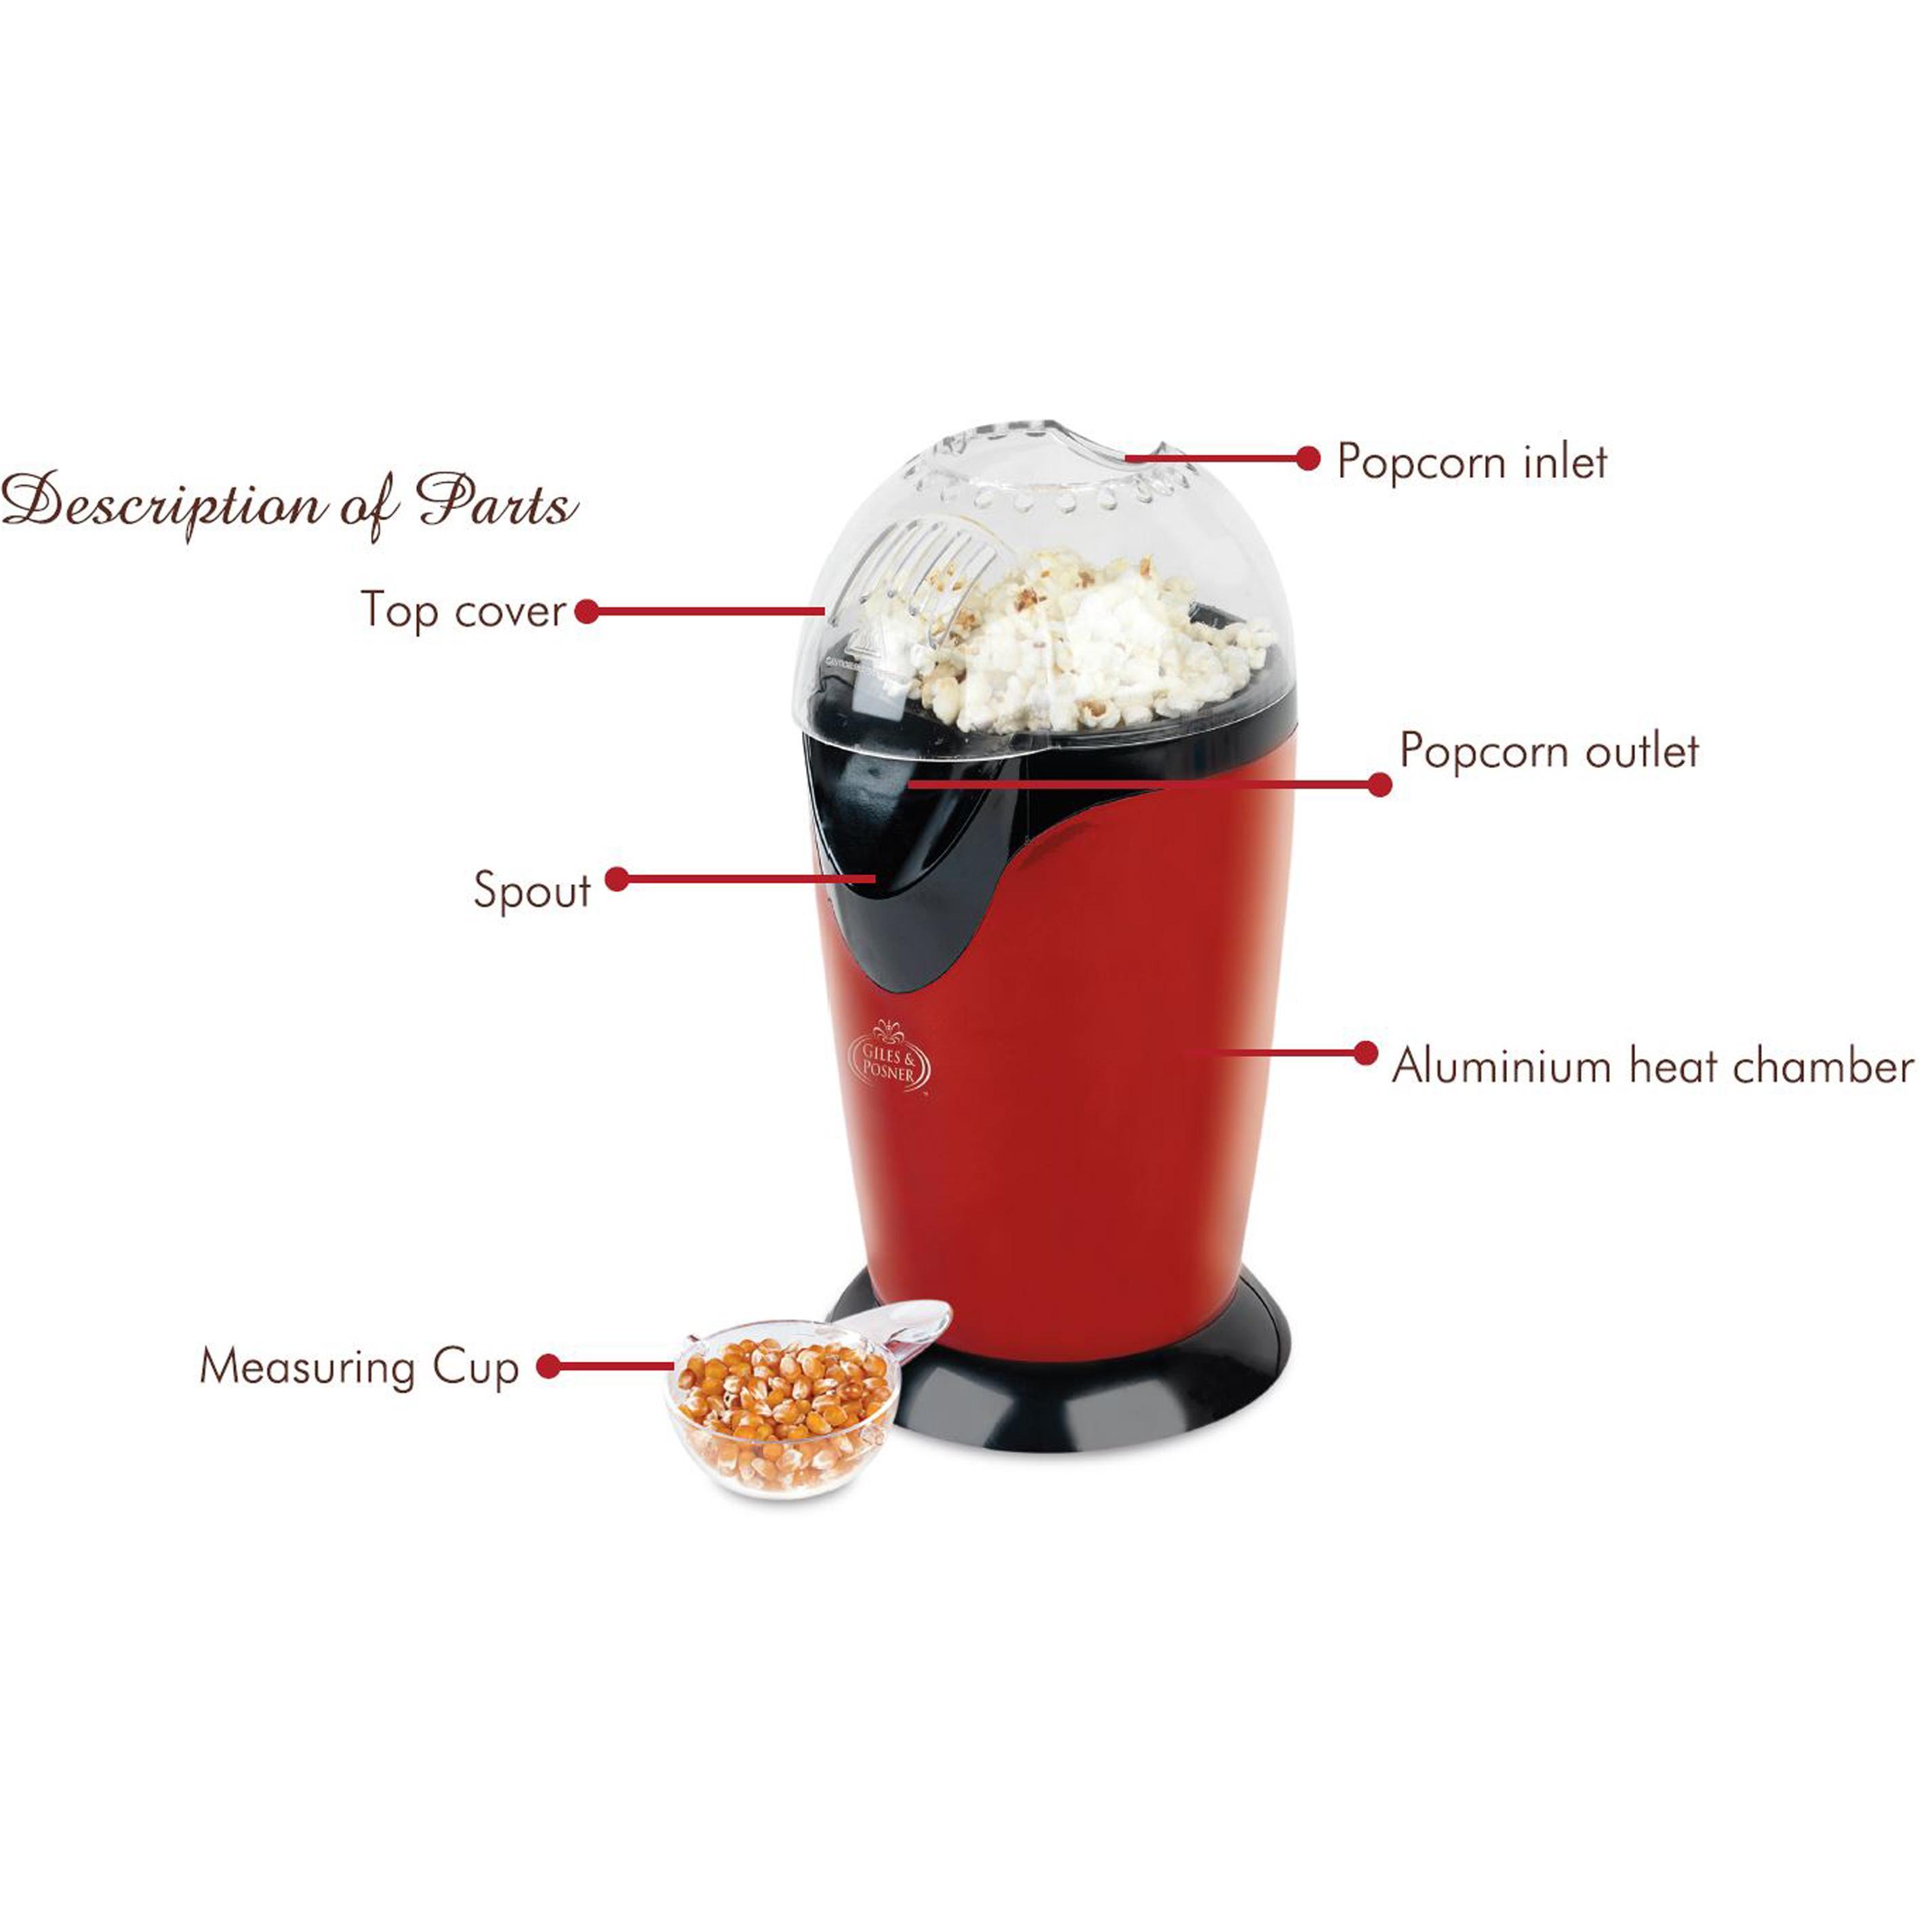 popcorn air popper instructions